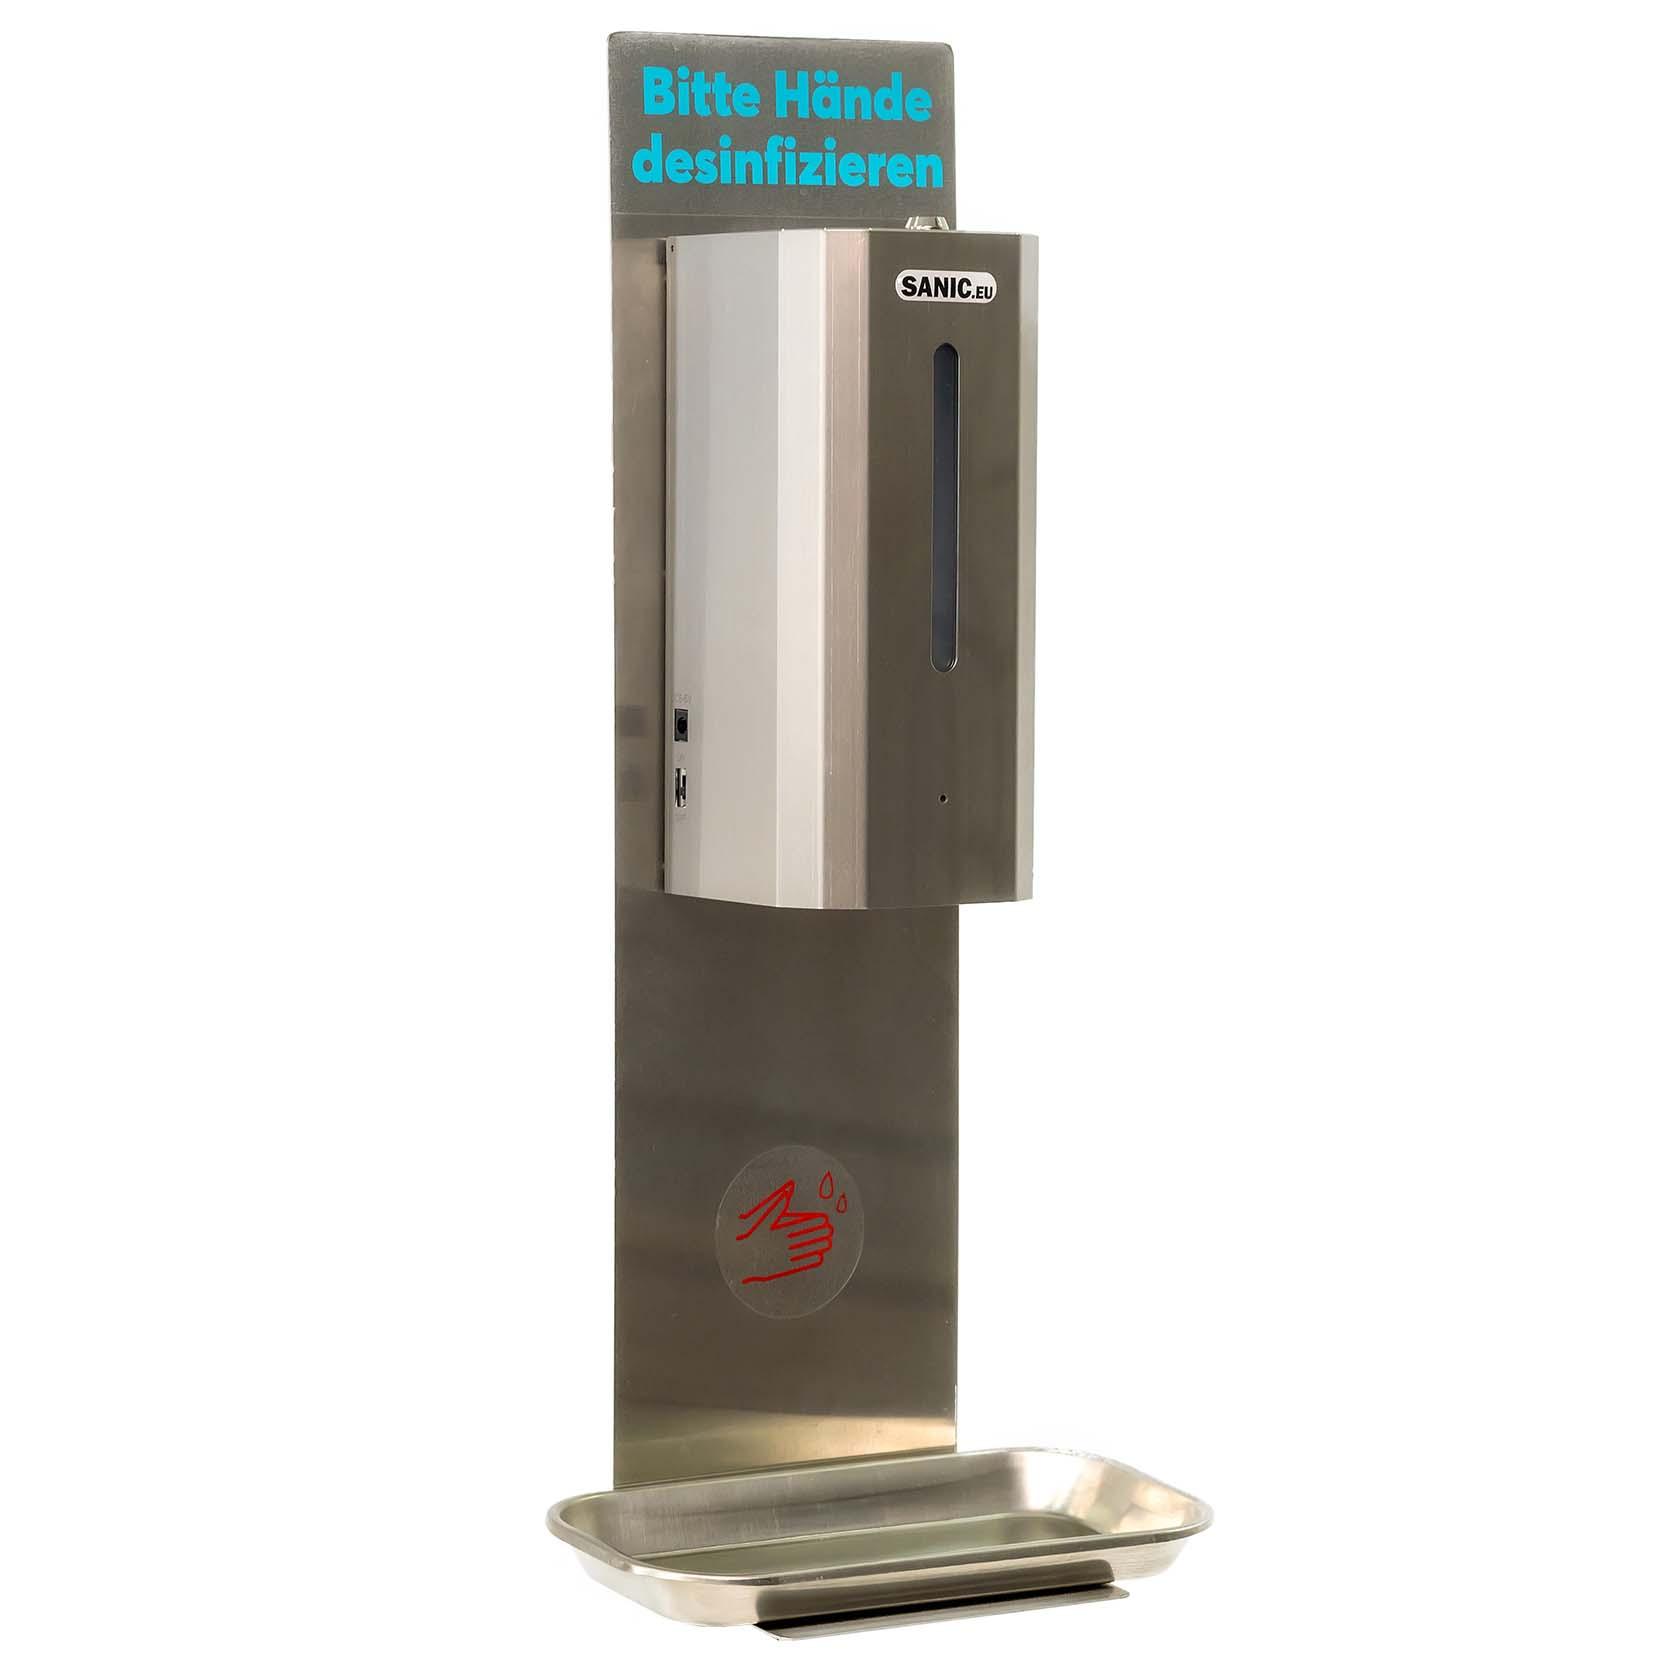 SANIC Wand-Desinfektionsspender aus Edelstahl mit Sensor